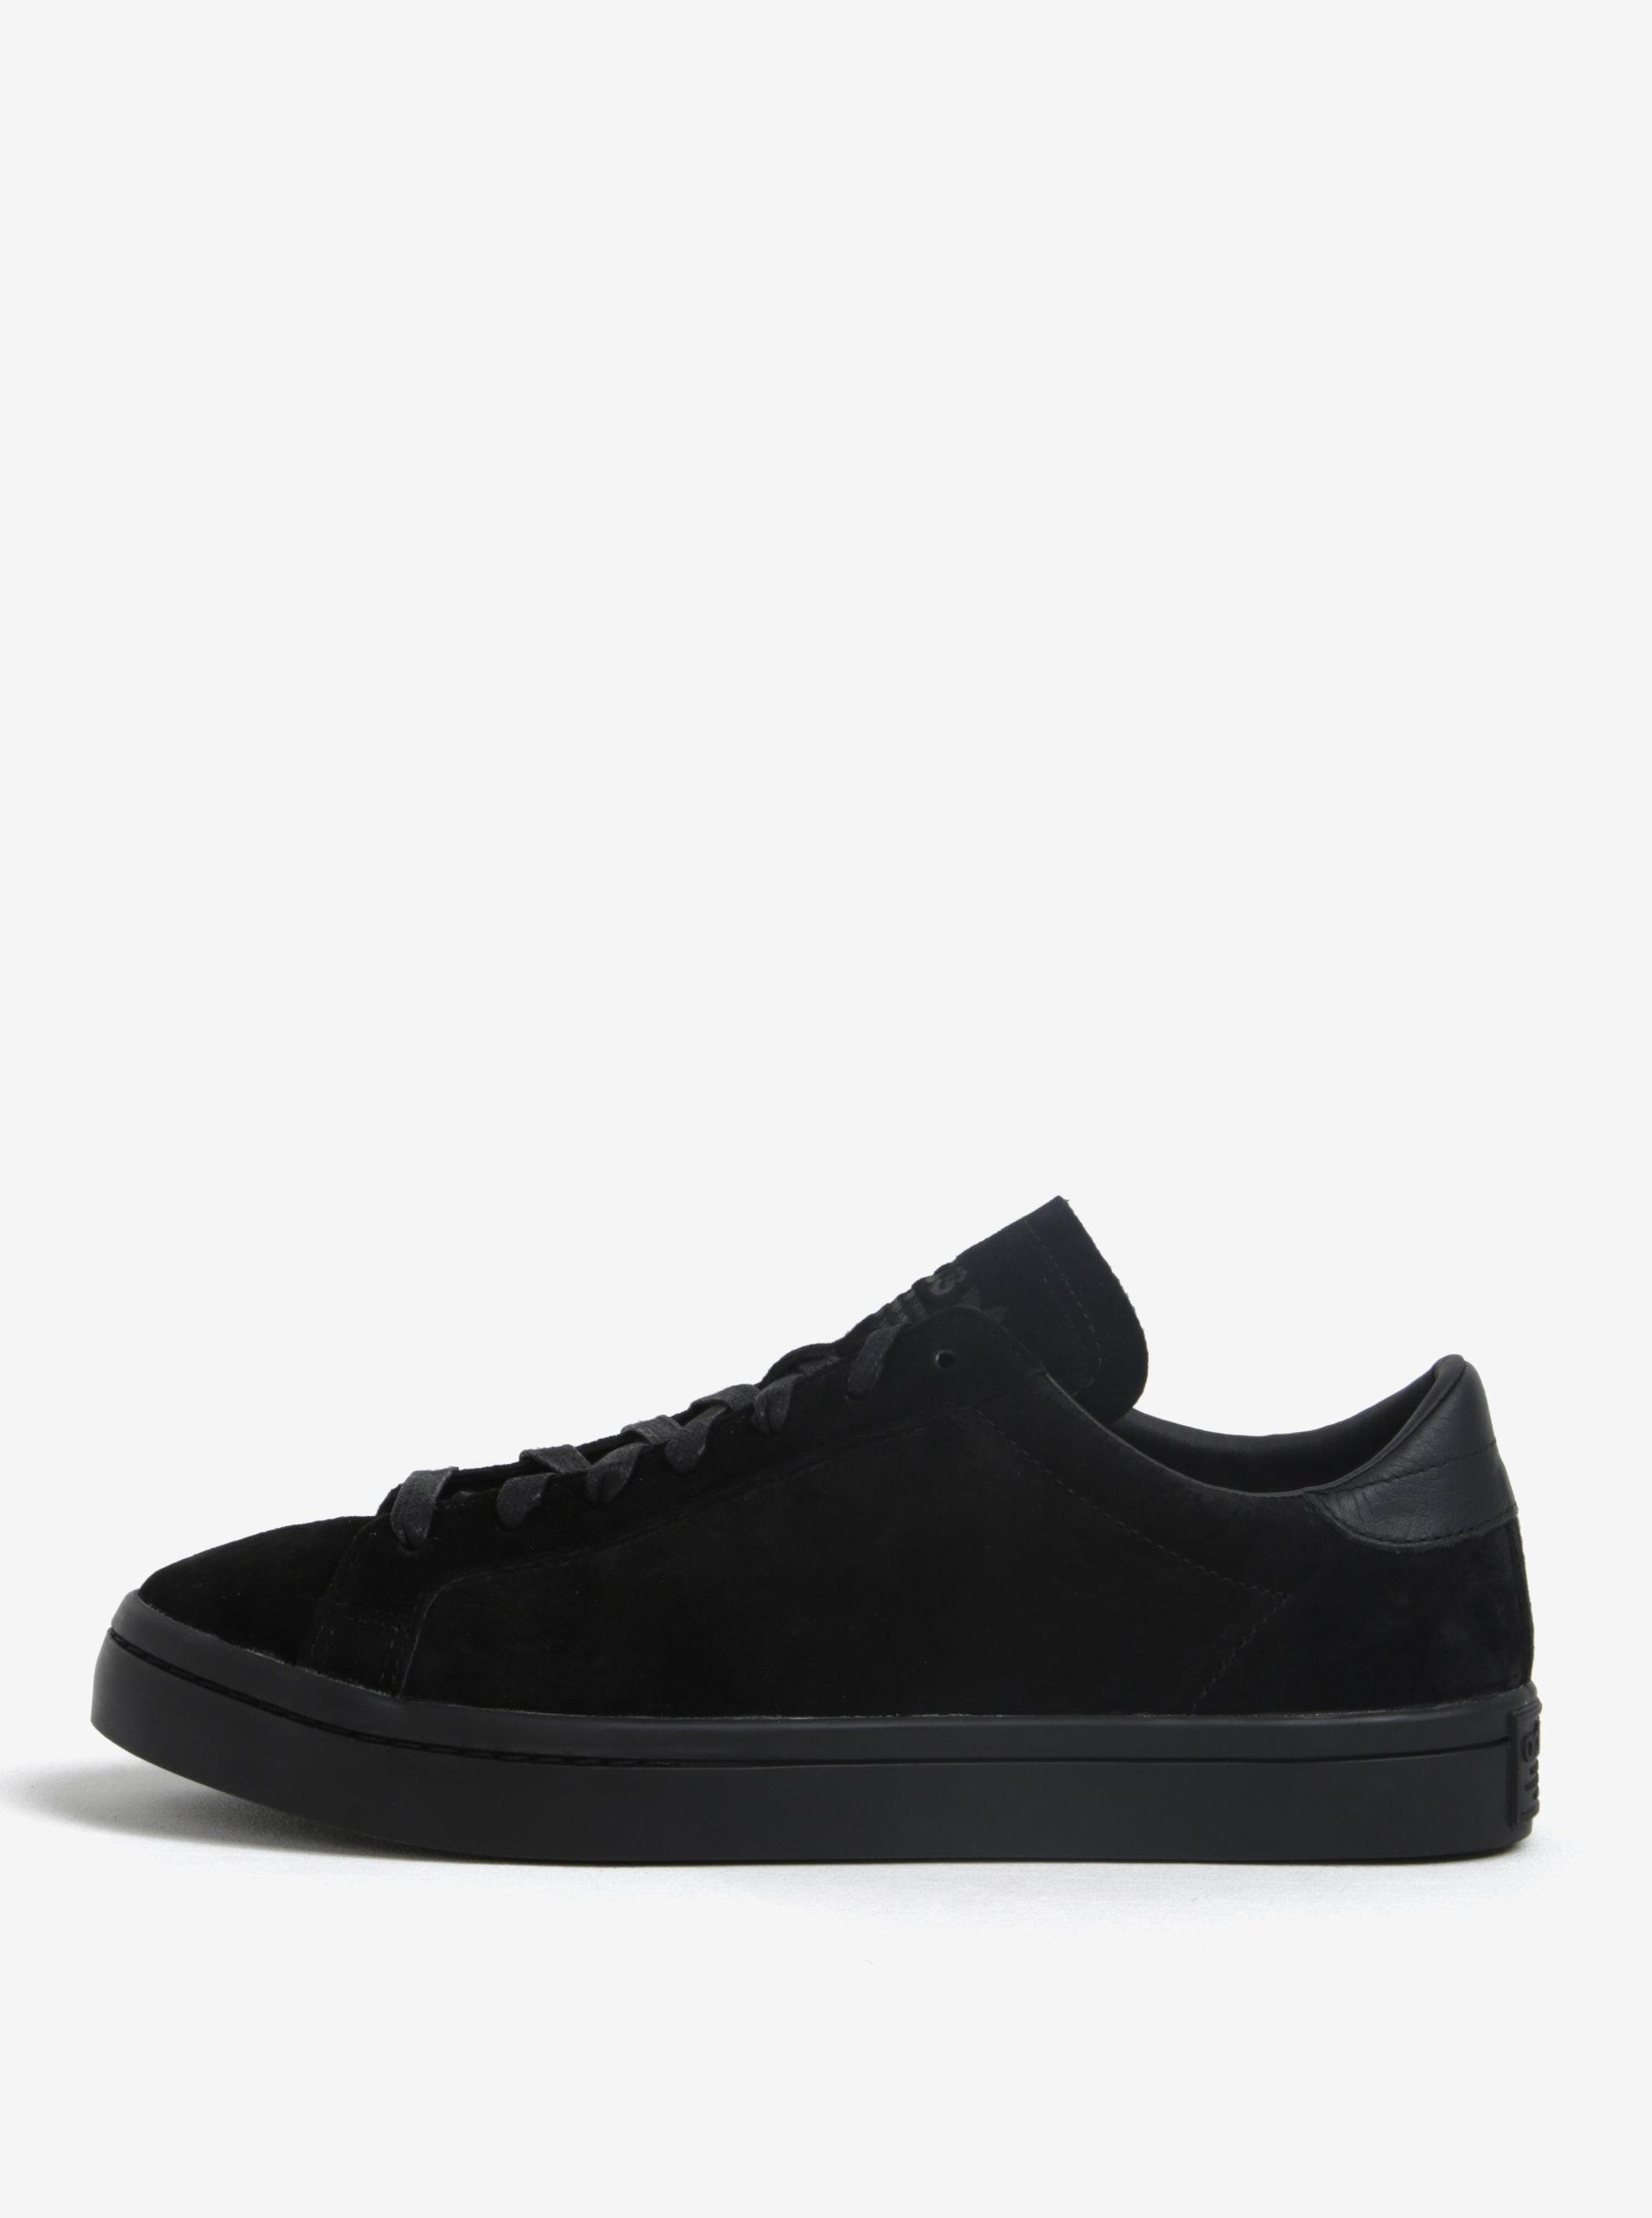 02950fca764 Černé pánské semišové tenisky adidas Originals Courtvantage ...